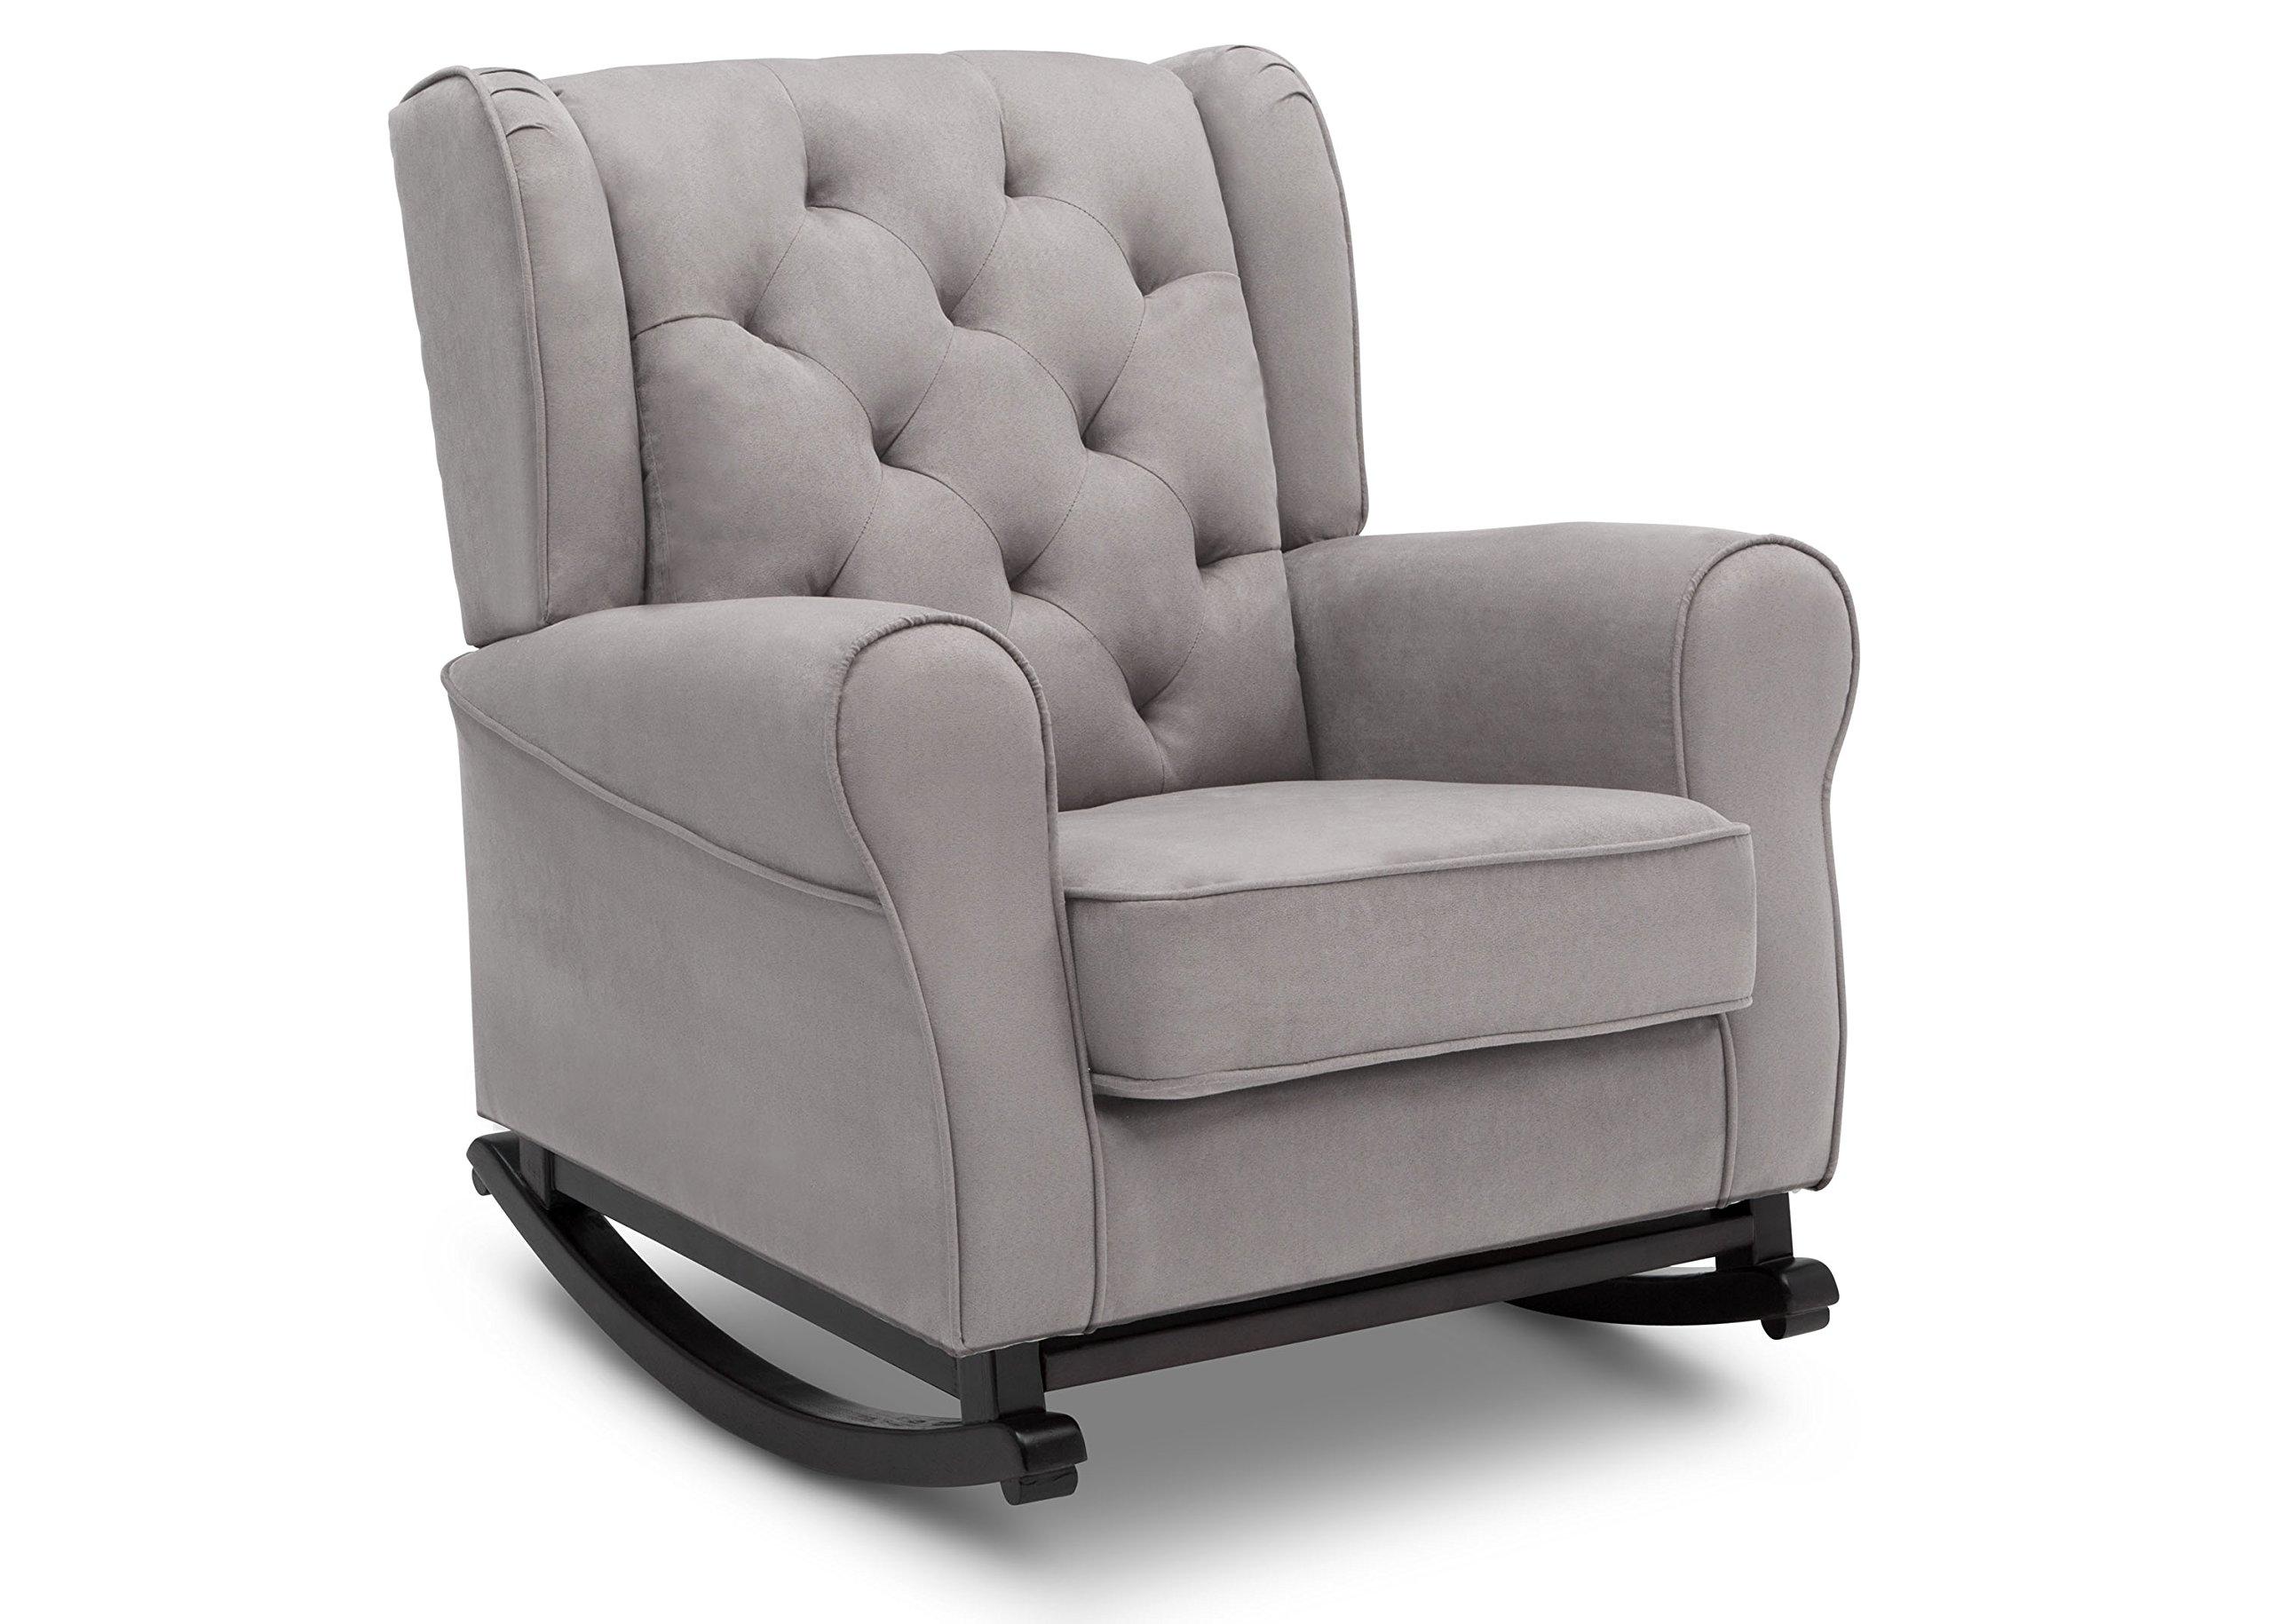 Delta Furniture Emma Upholstered Rocking Chair, Dove Grey